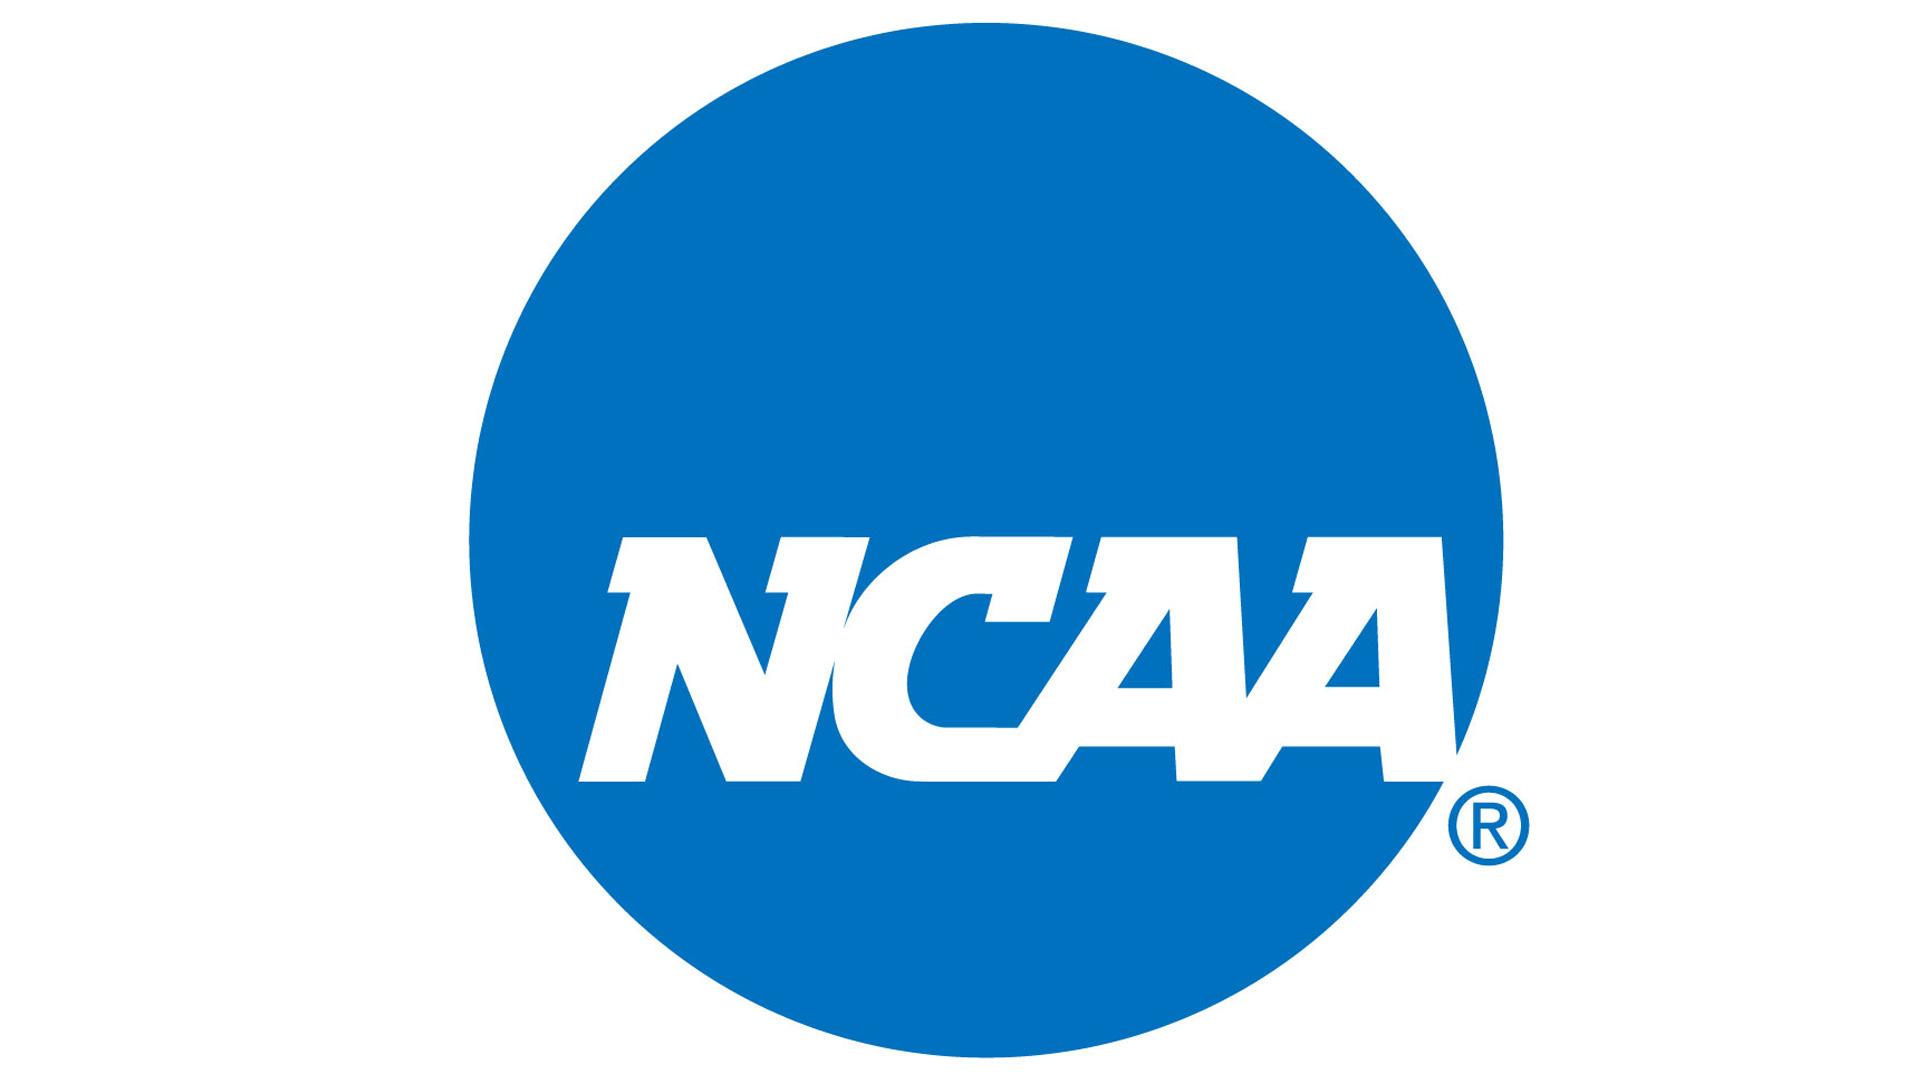 2018 ncaa championships schedule other sports sporting news rh sportingnews com NCAA Team Logos SEC Team Logos